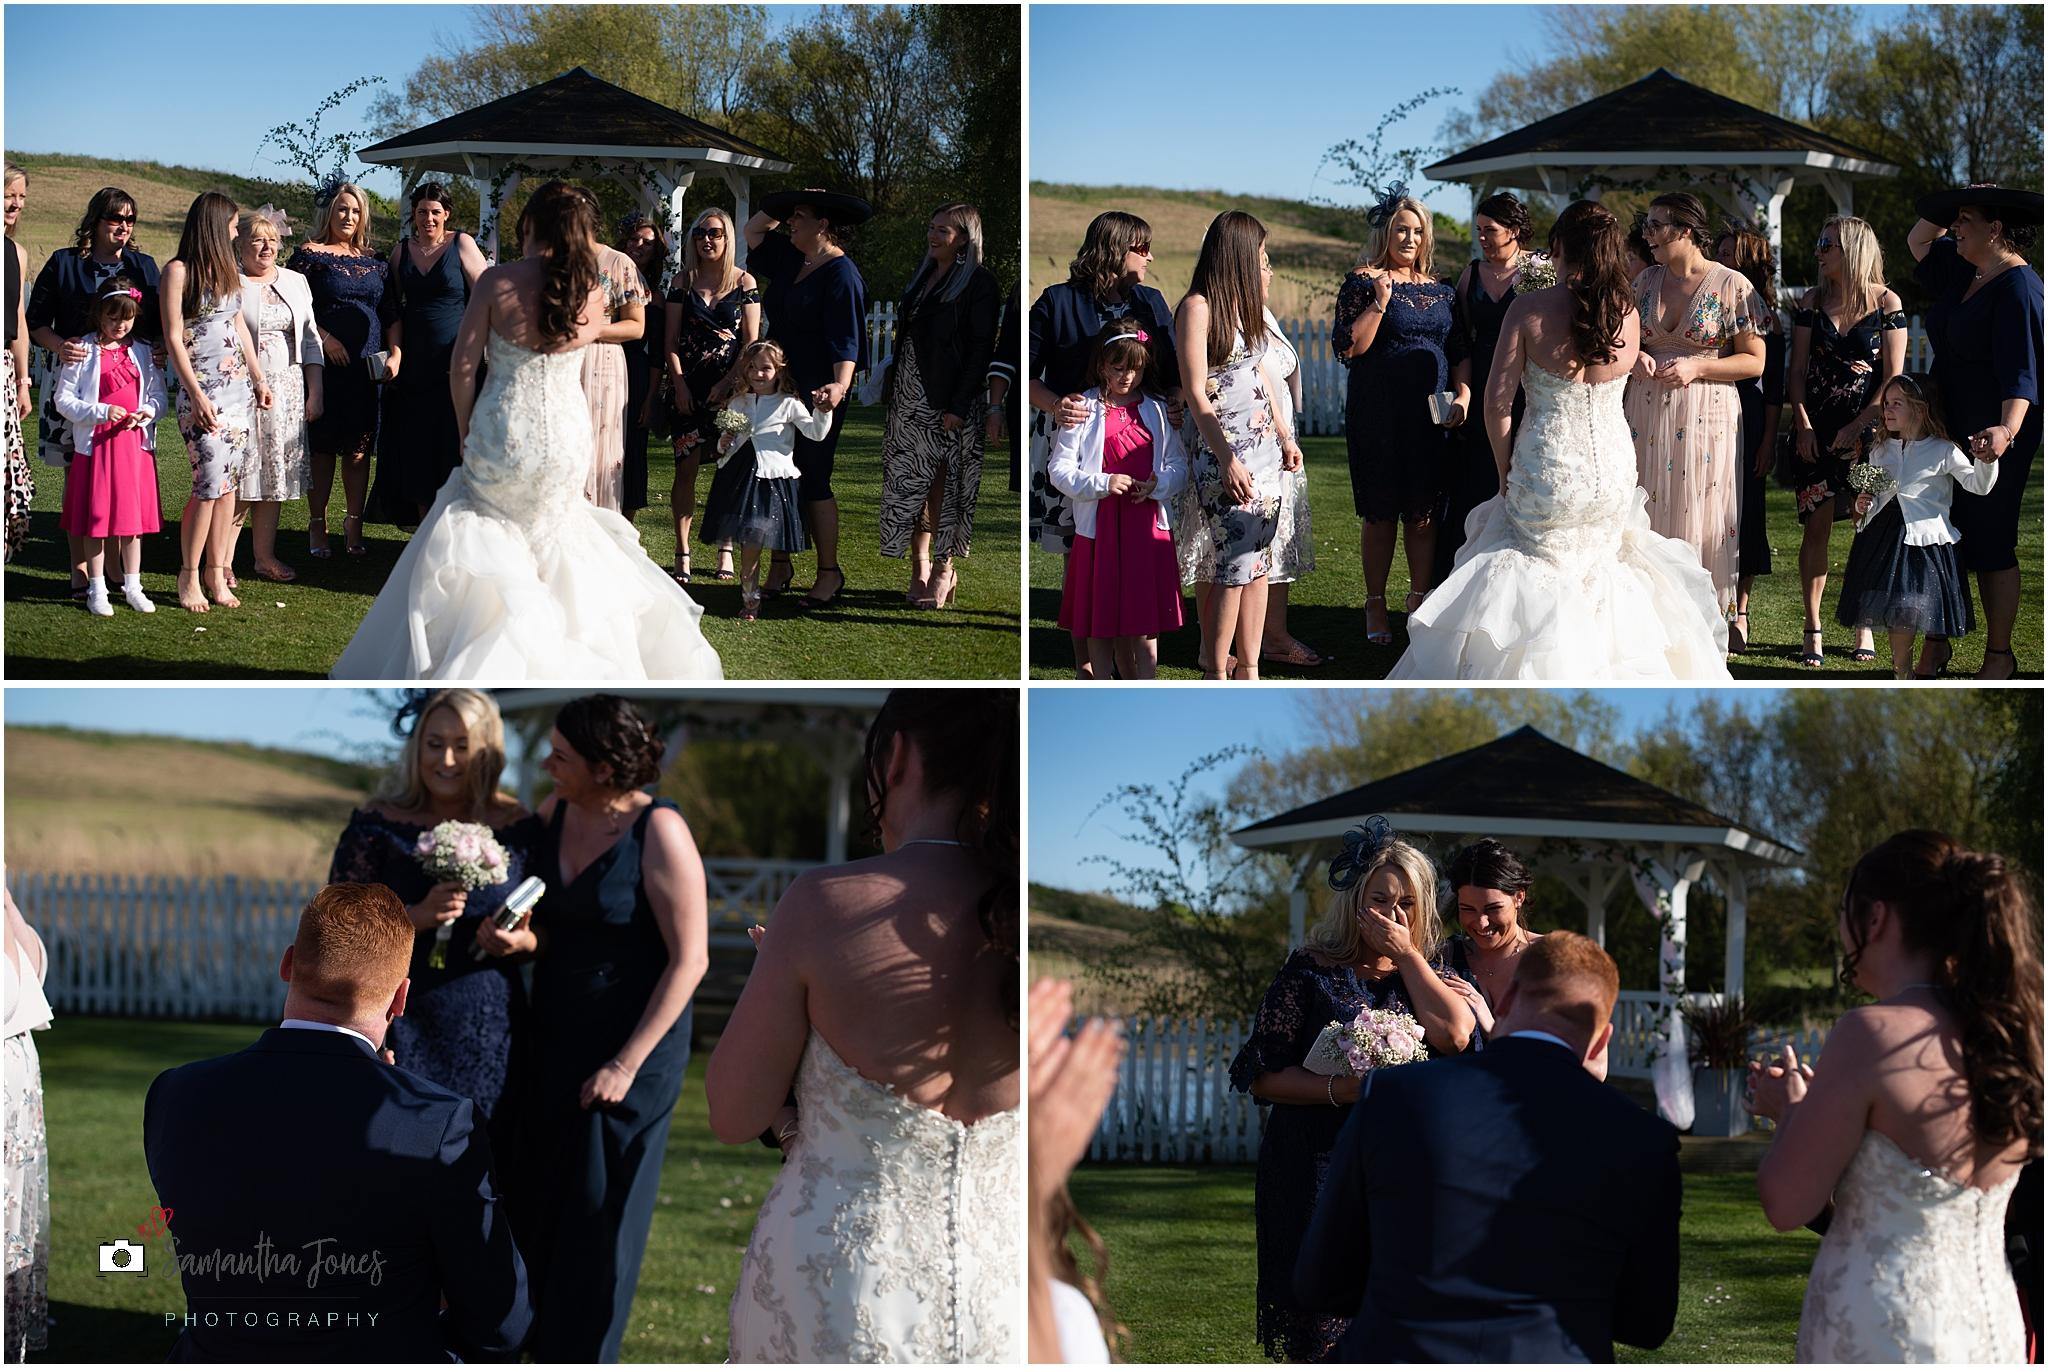 Emma and Aaron twilight wedding at Stonelees a wedding proposal